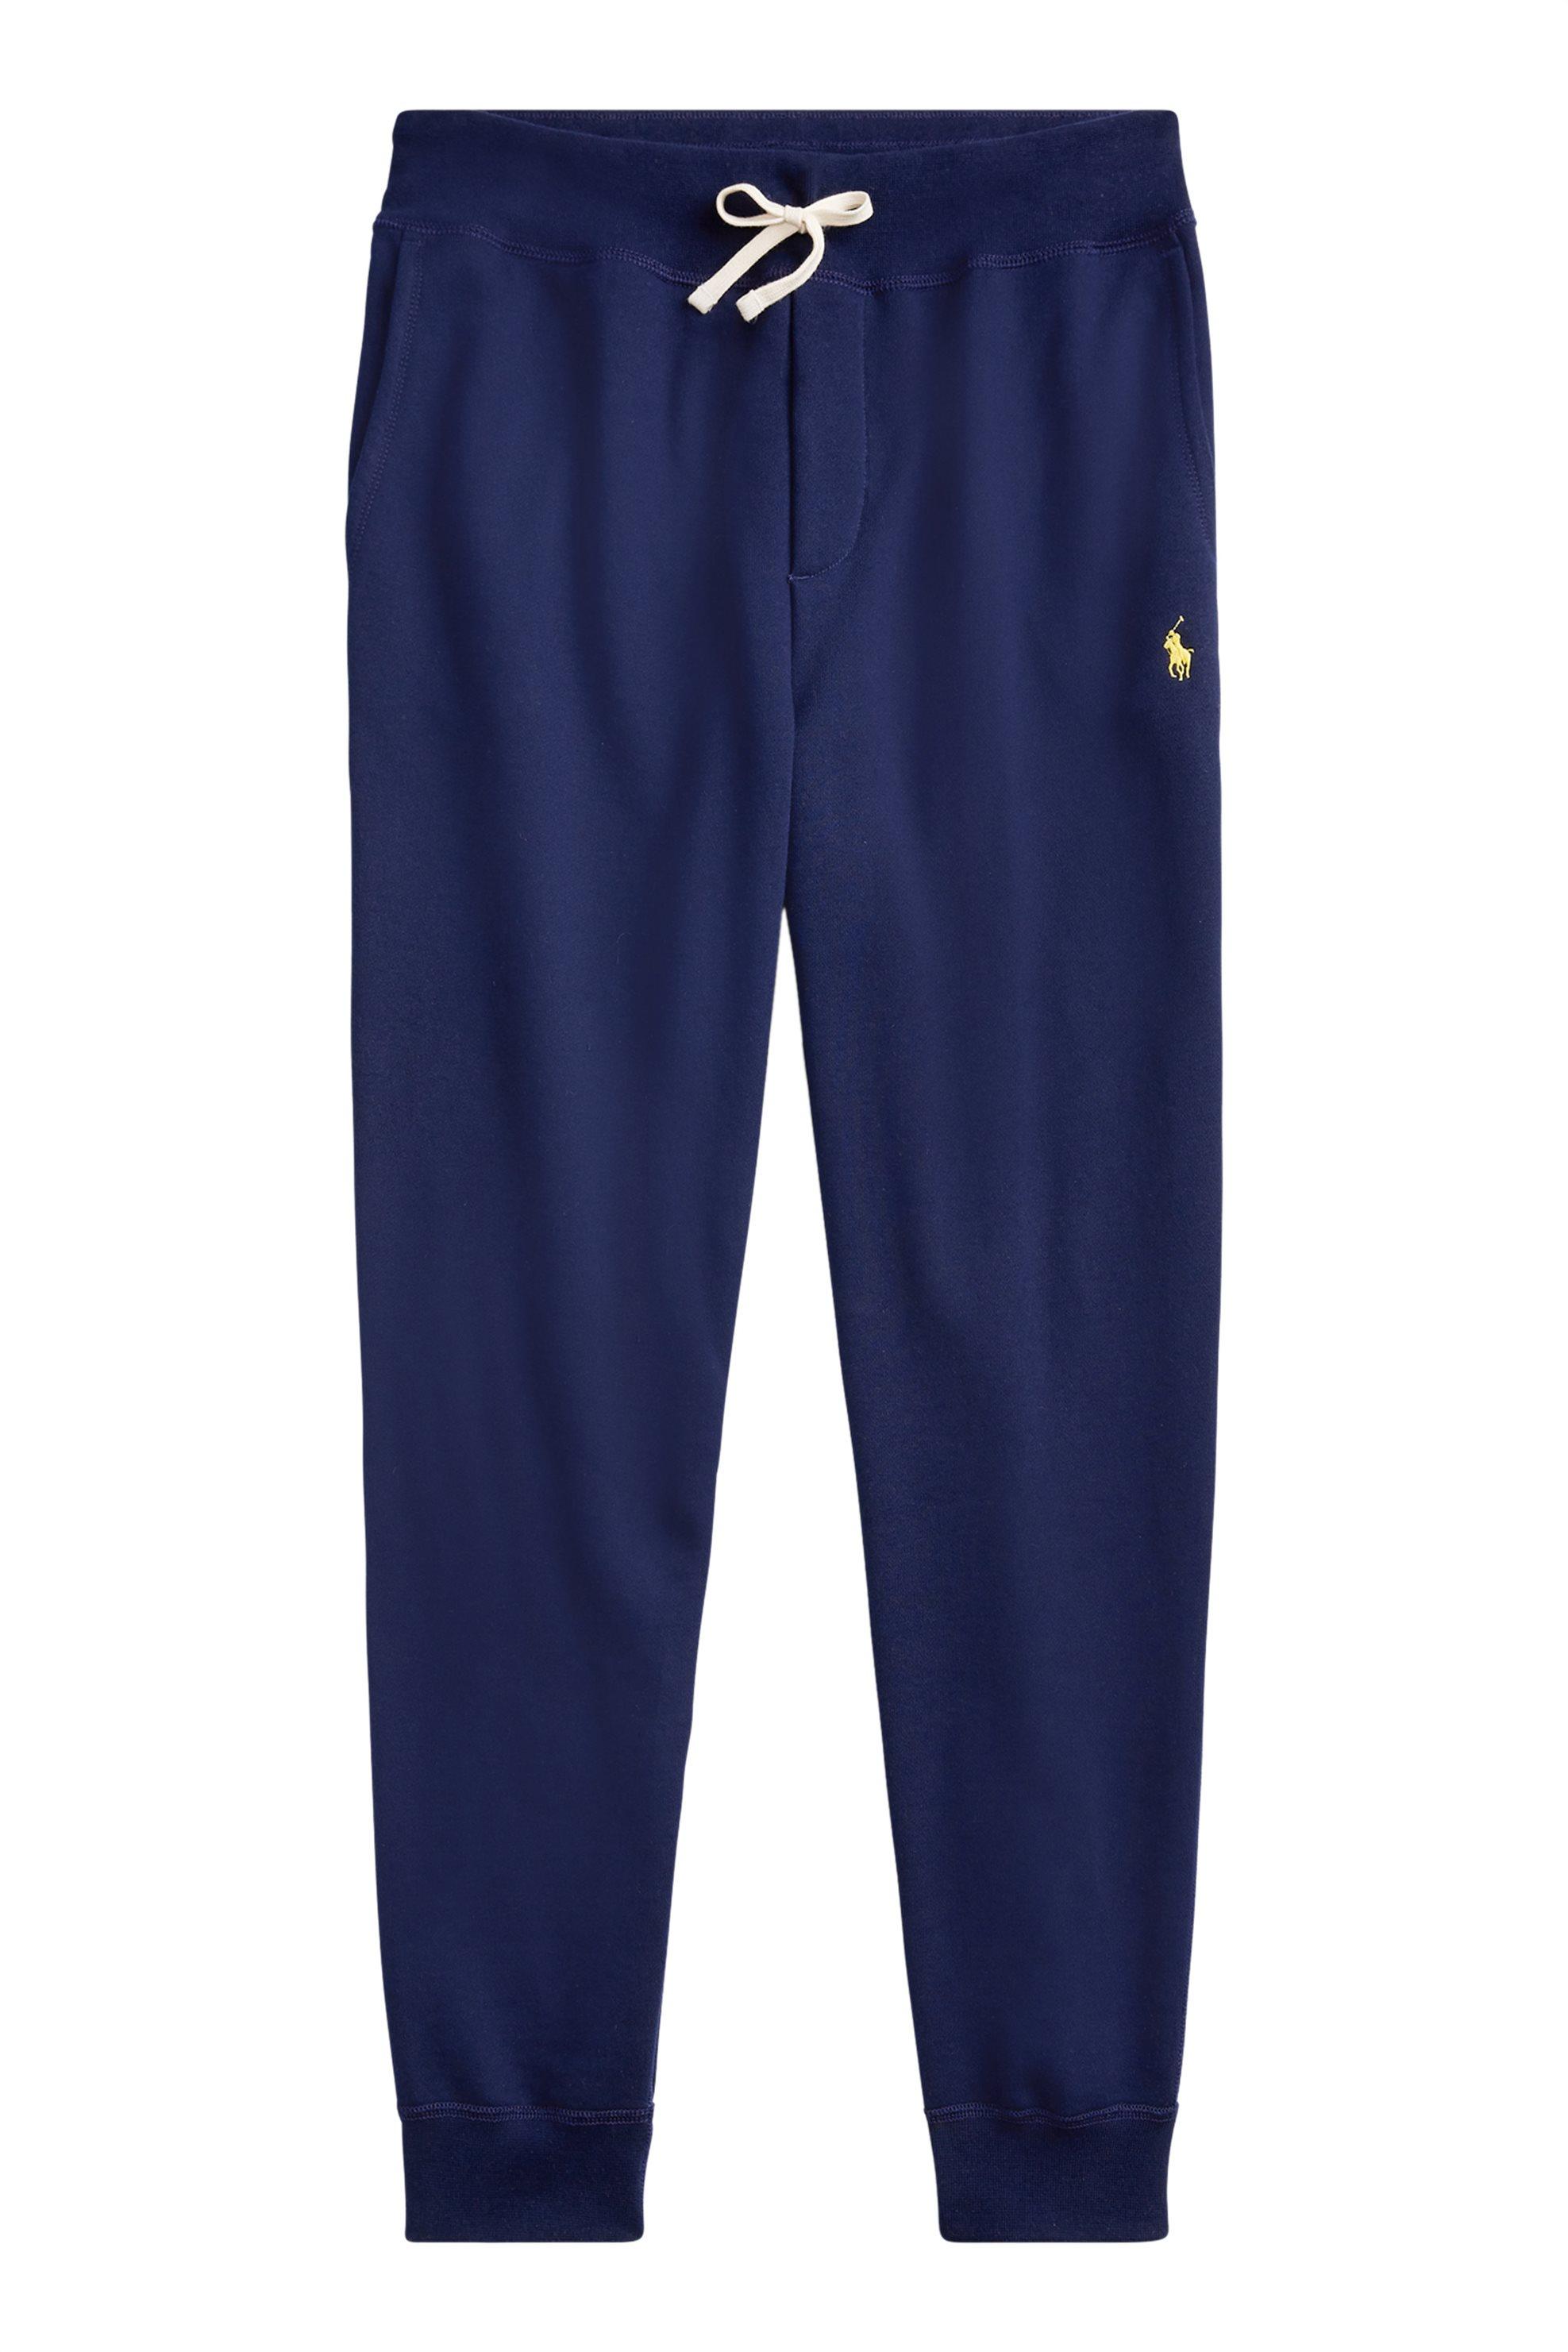 Polo Ralph Lauren ανδρική φόρμα σε ίσια γραμμή - 710600105002 - Μπλε Σκούρο ανδρασ   ρουχα   παντελόνια   φόρμες